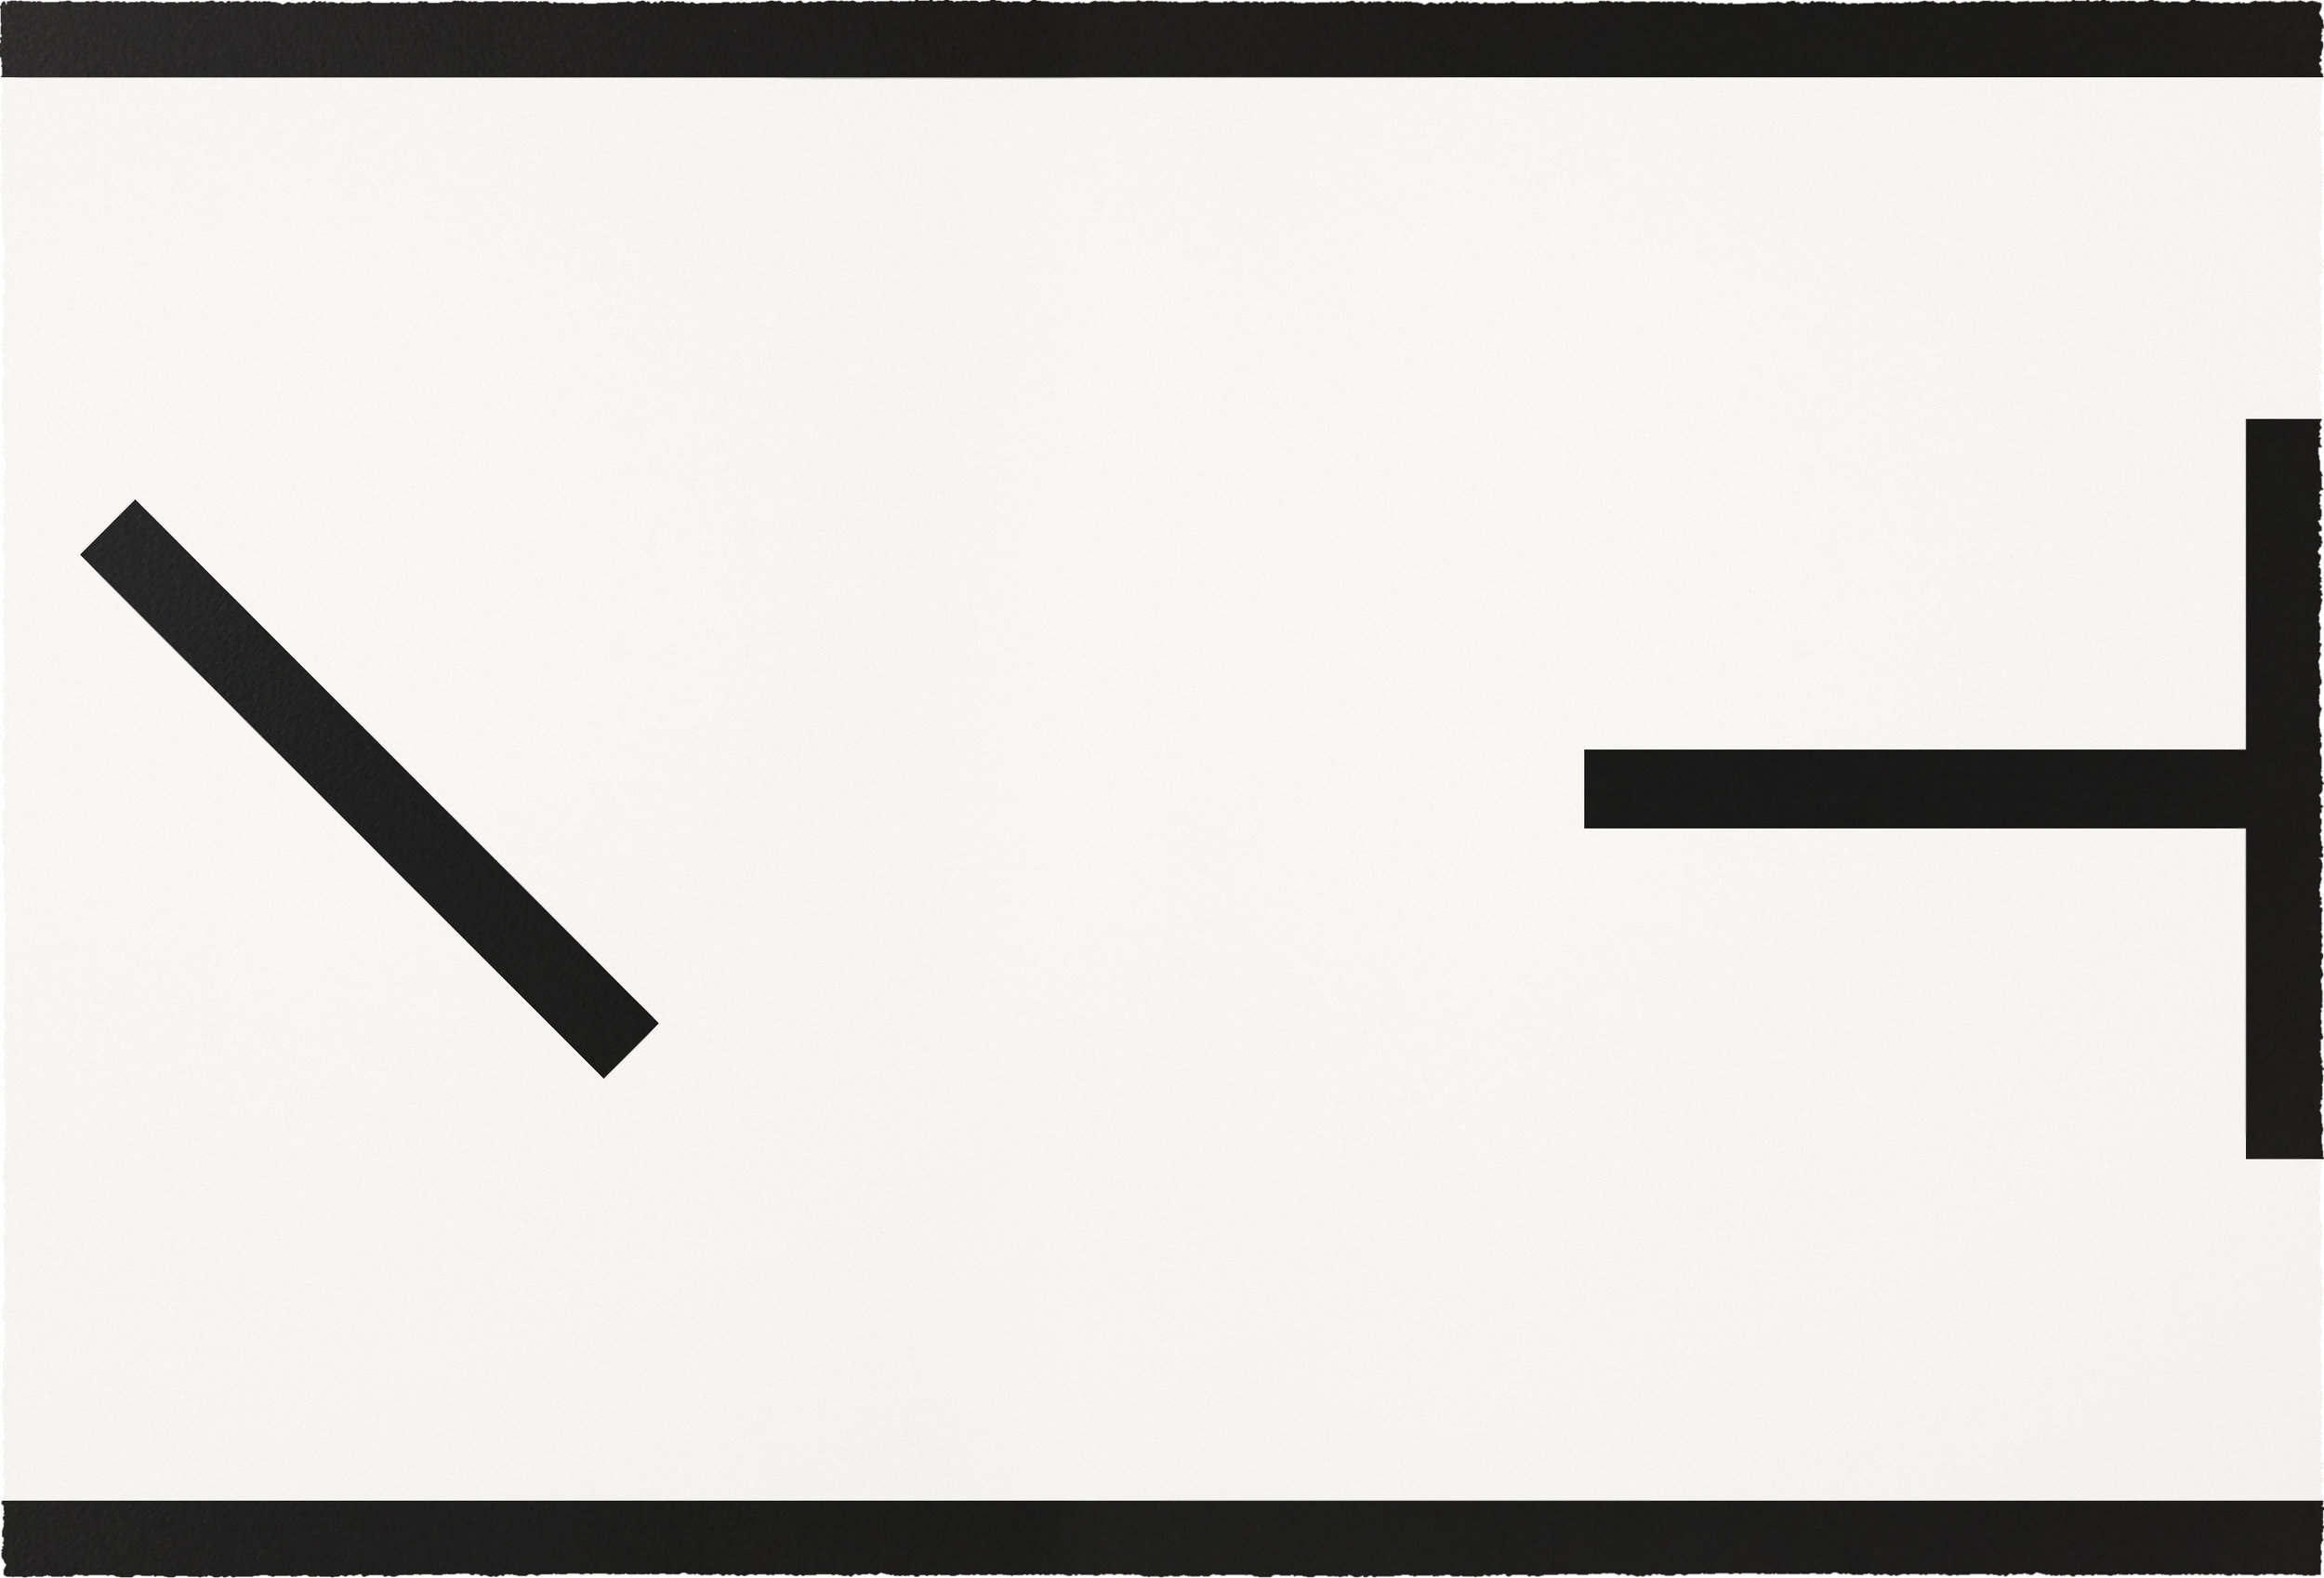 Cinco Líneas — Diego Berjon